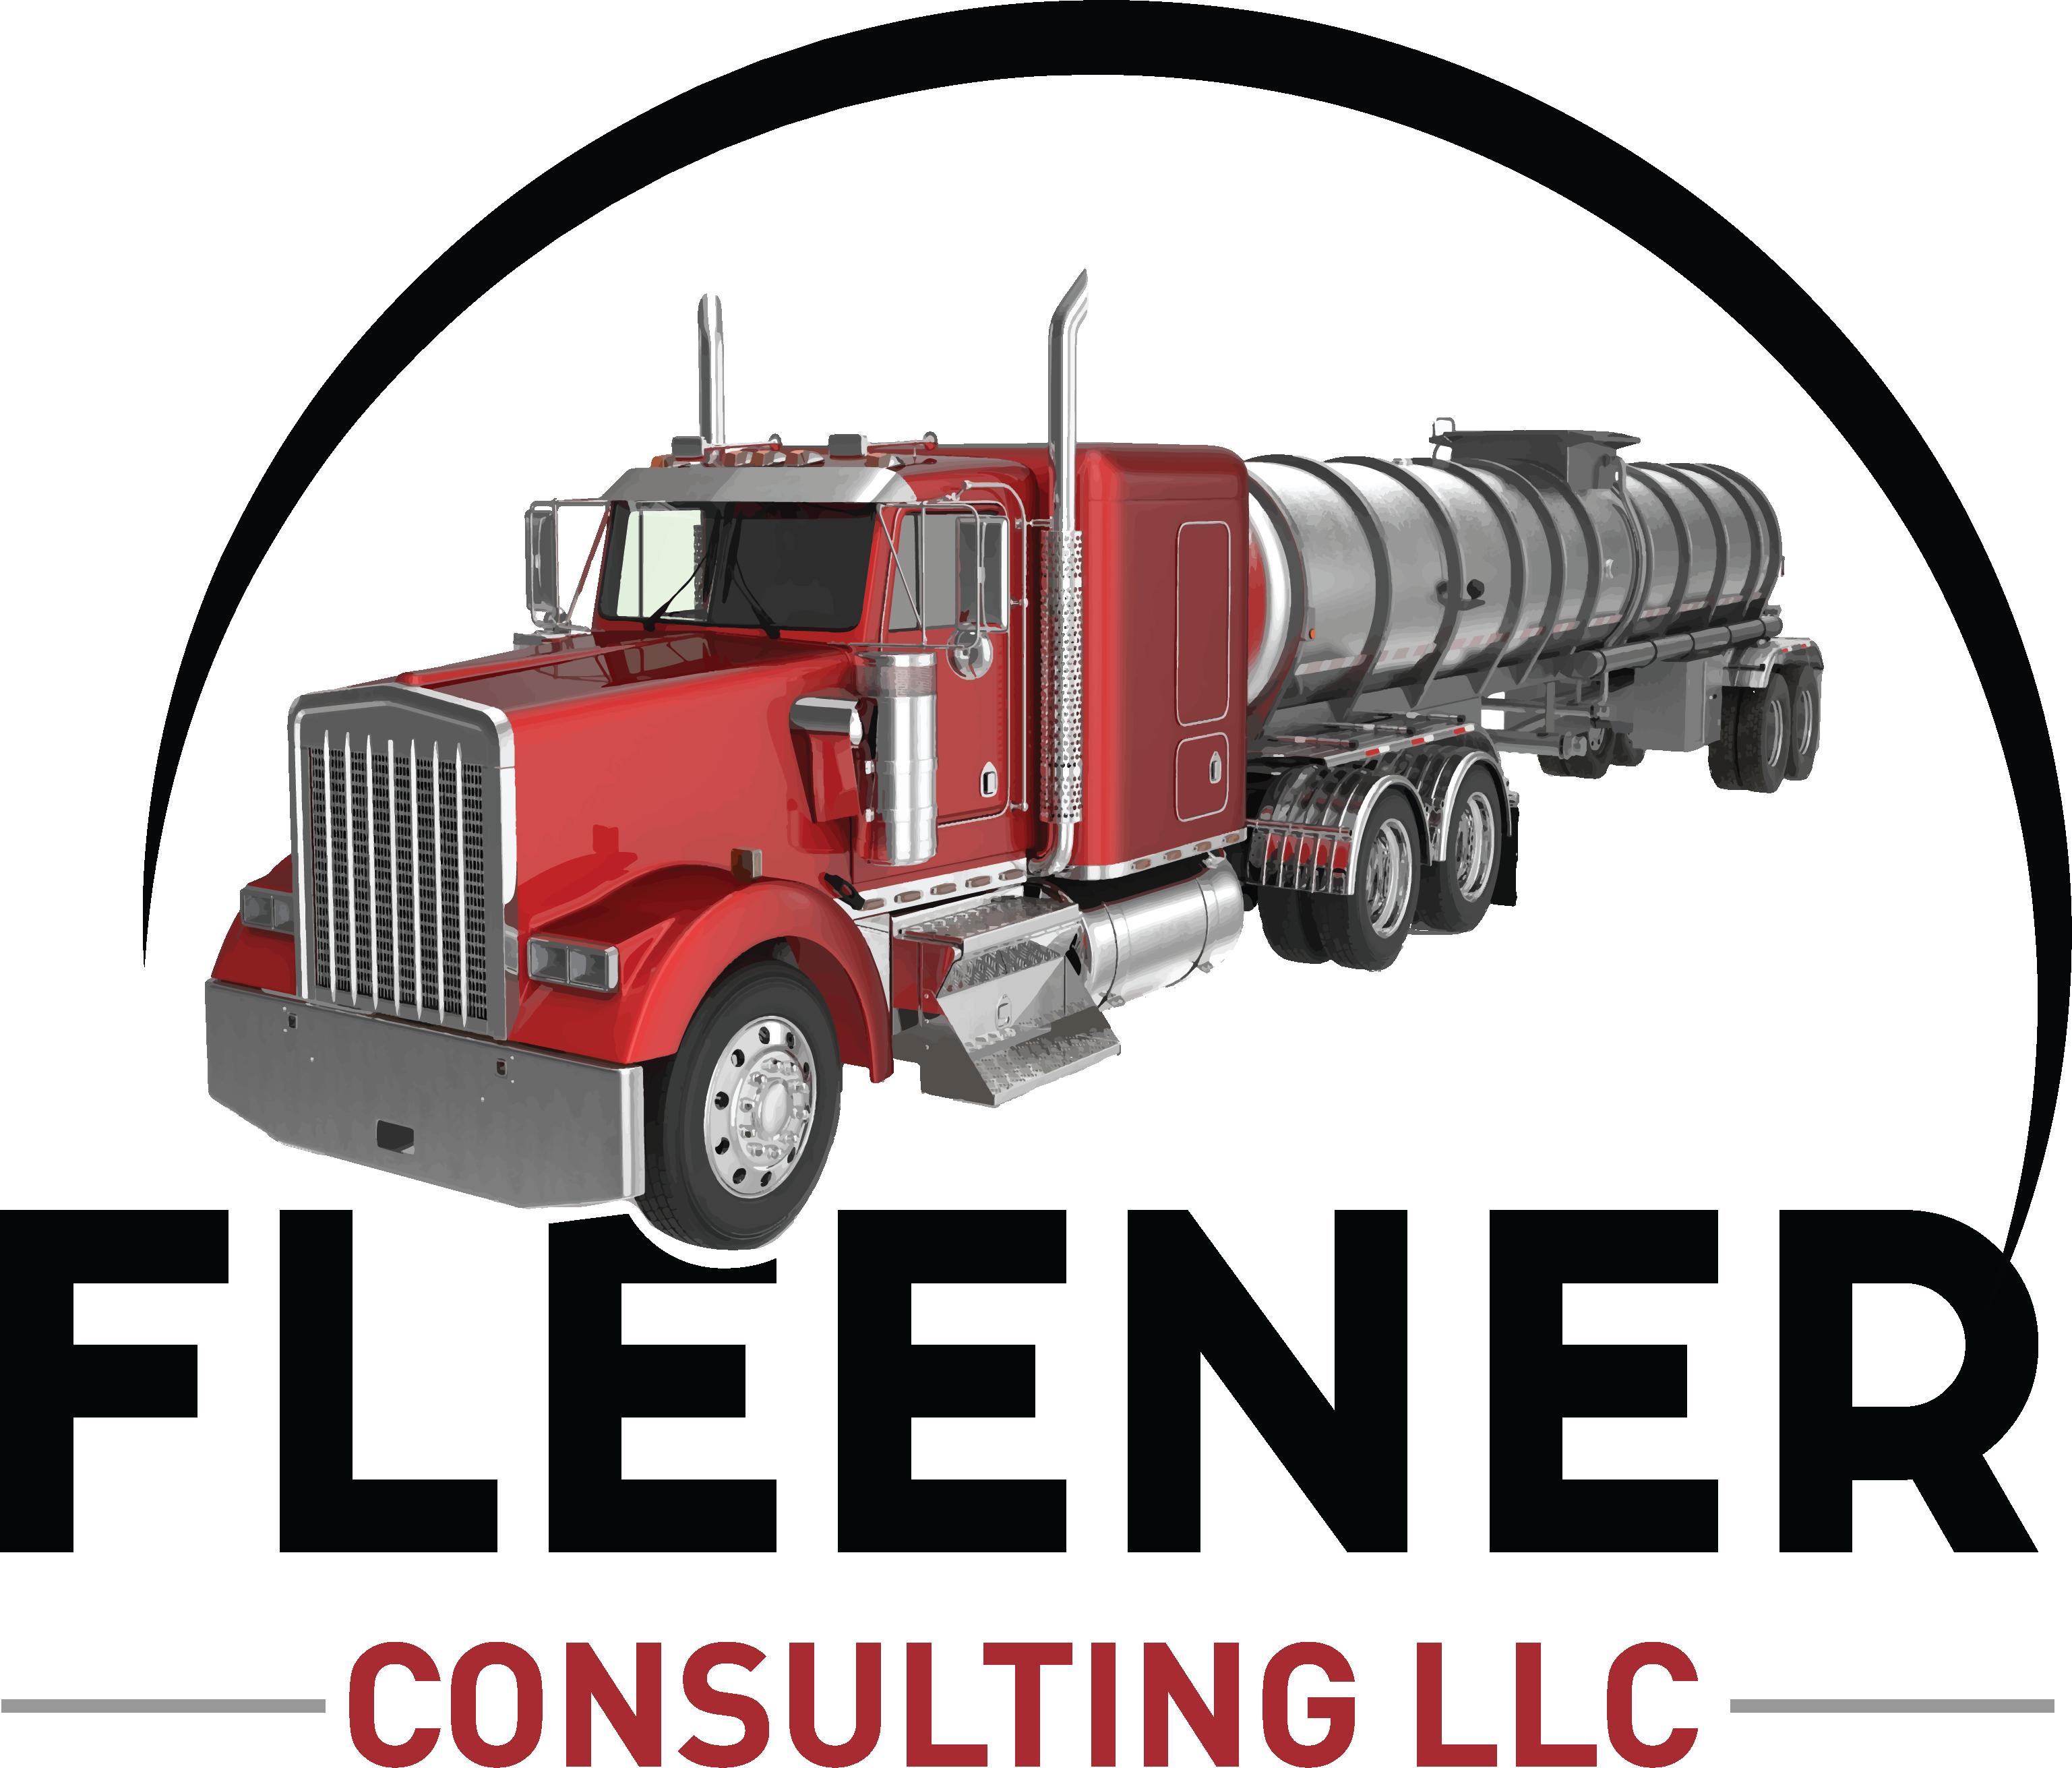 Fleener Consulting LLC